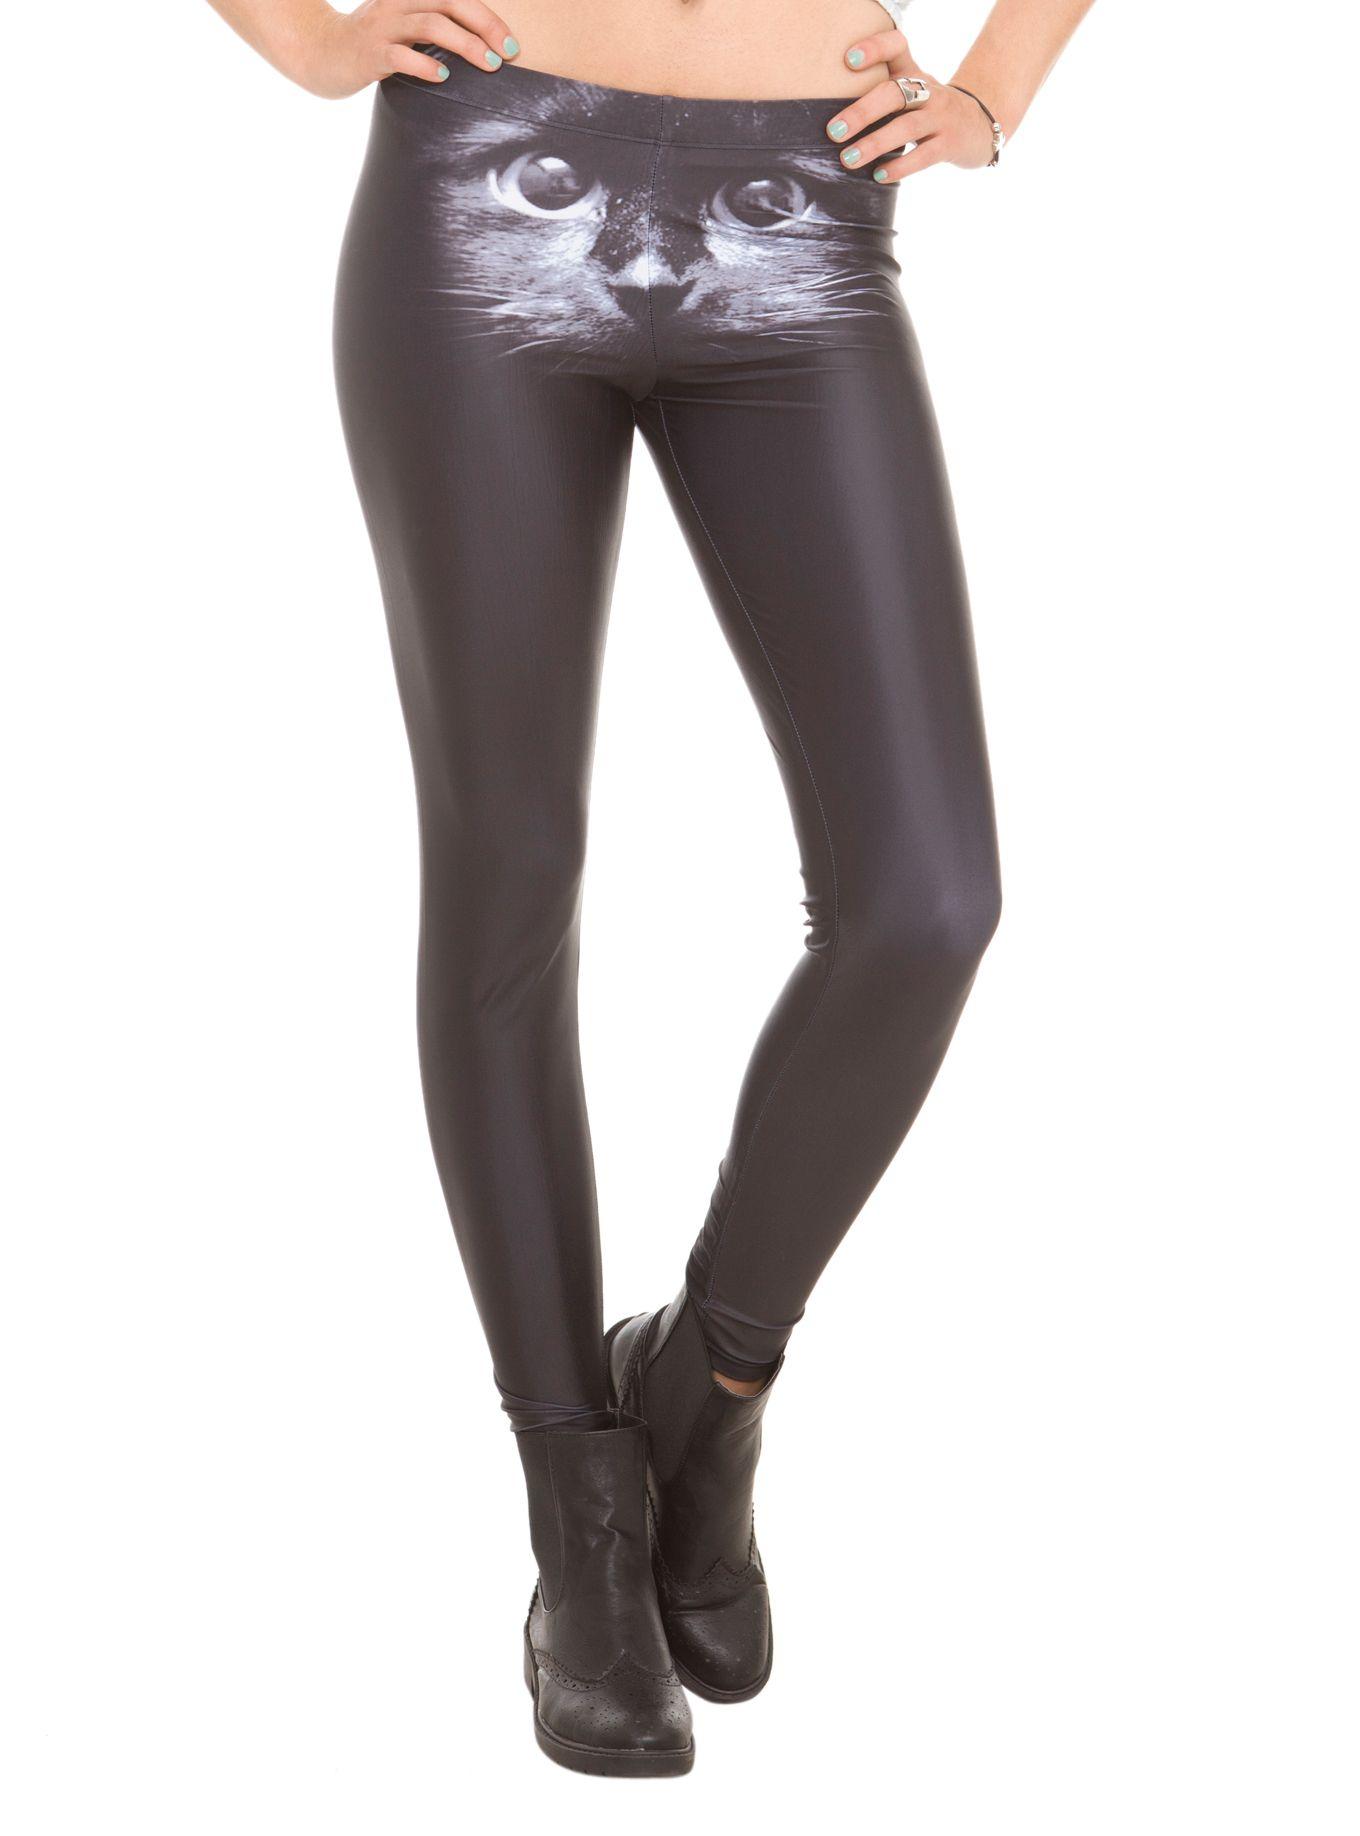 Iron Topic Black Shop Cat Hot Leggings Pinterest Cool Fist O5wrxX4qO